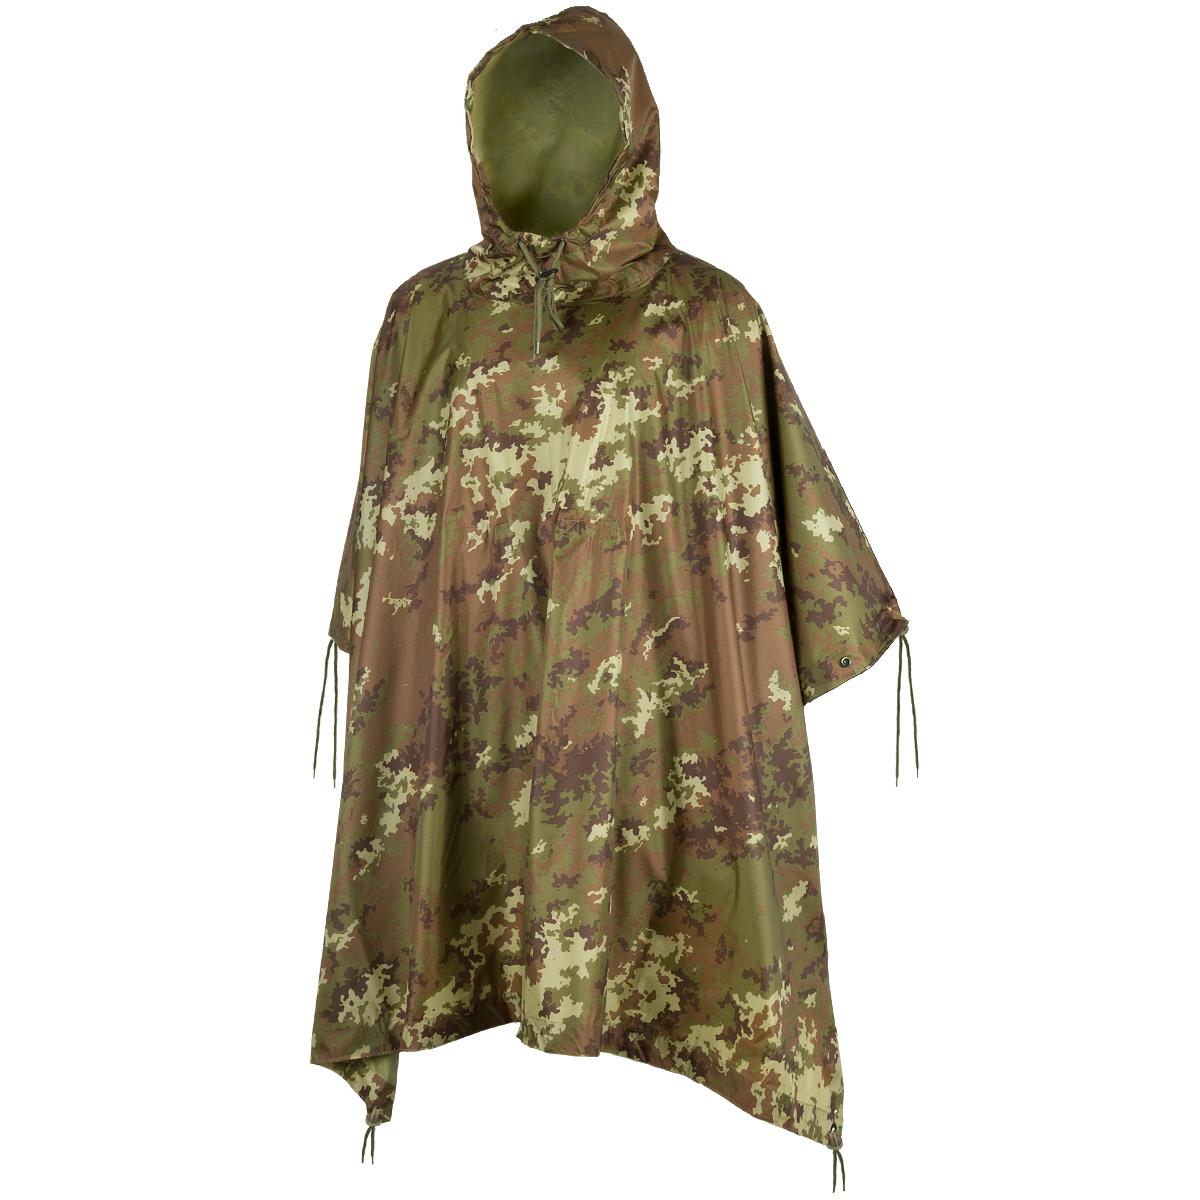 Waterproof Hooded Rain Ripstop Poncho Woodland Camo by Mil-Tec